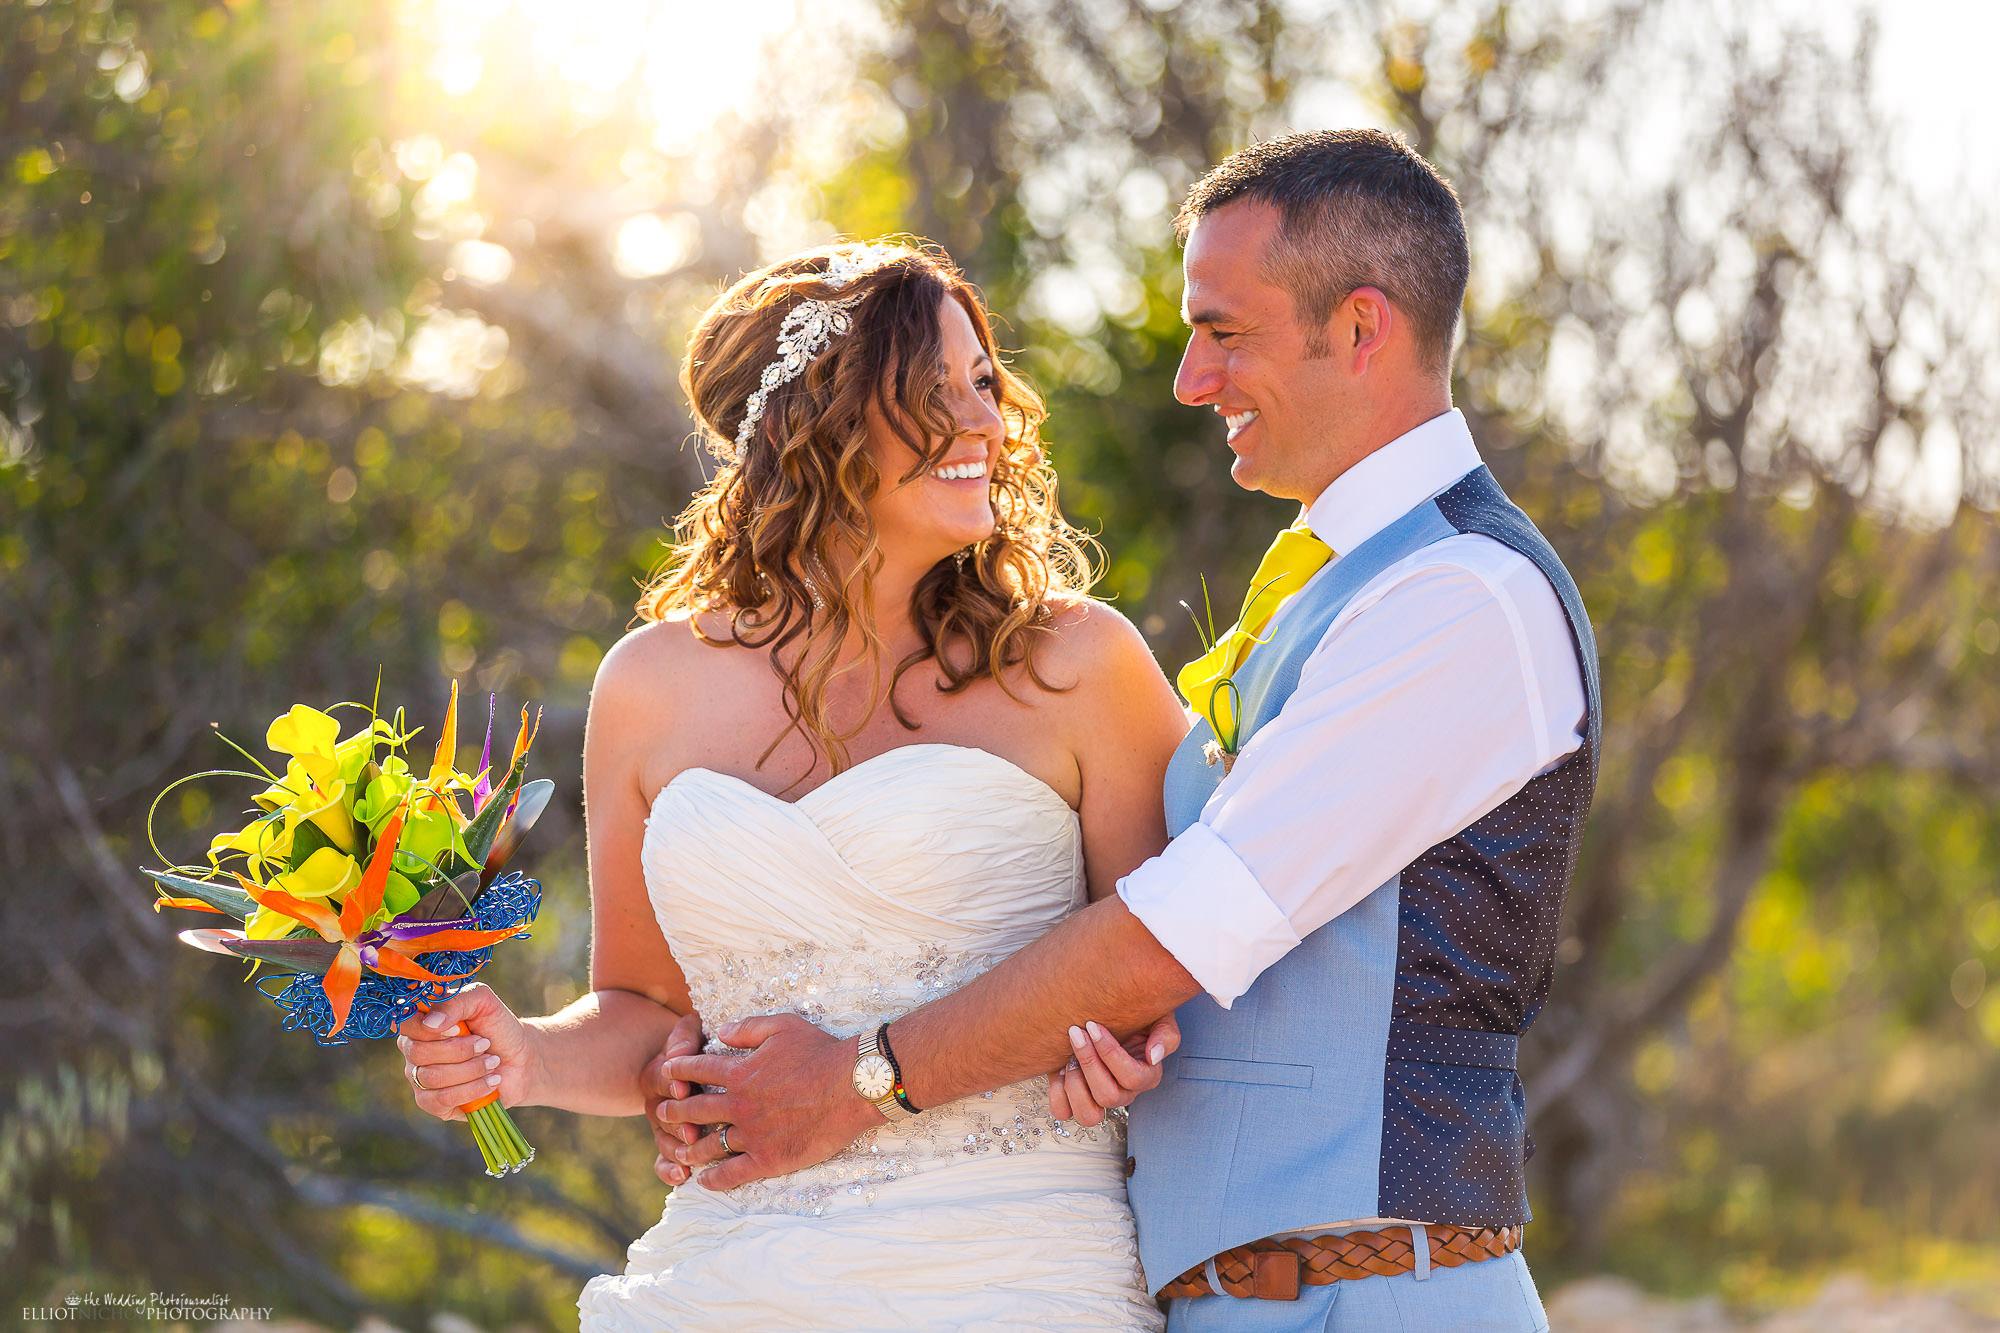 bride-groom-newlyweds-portrait-Northeast-photographer